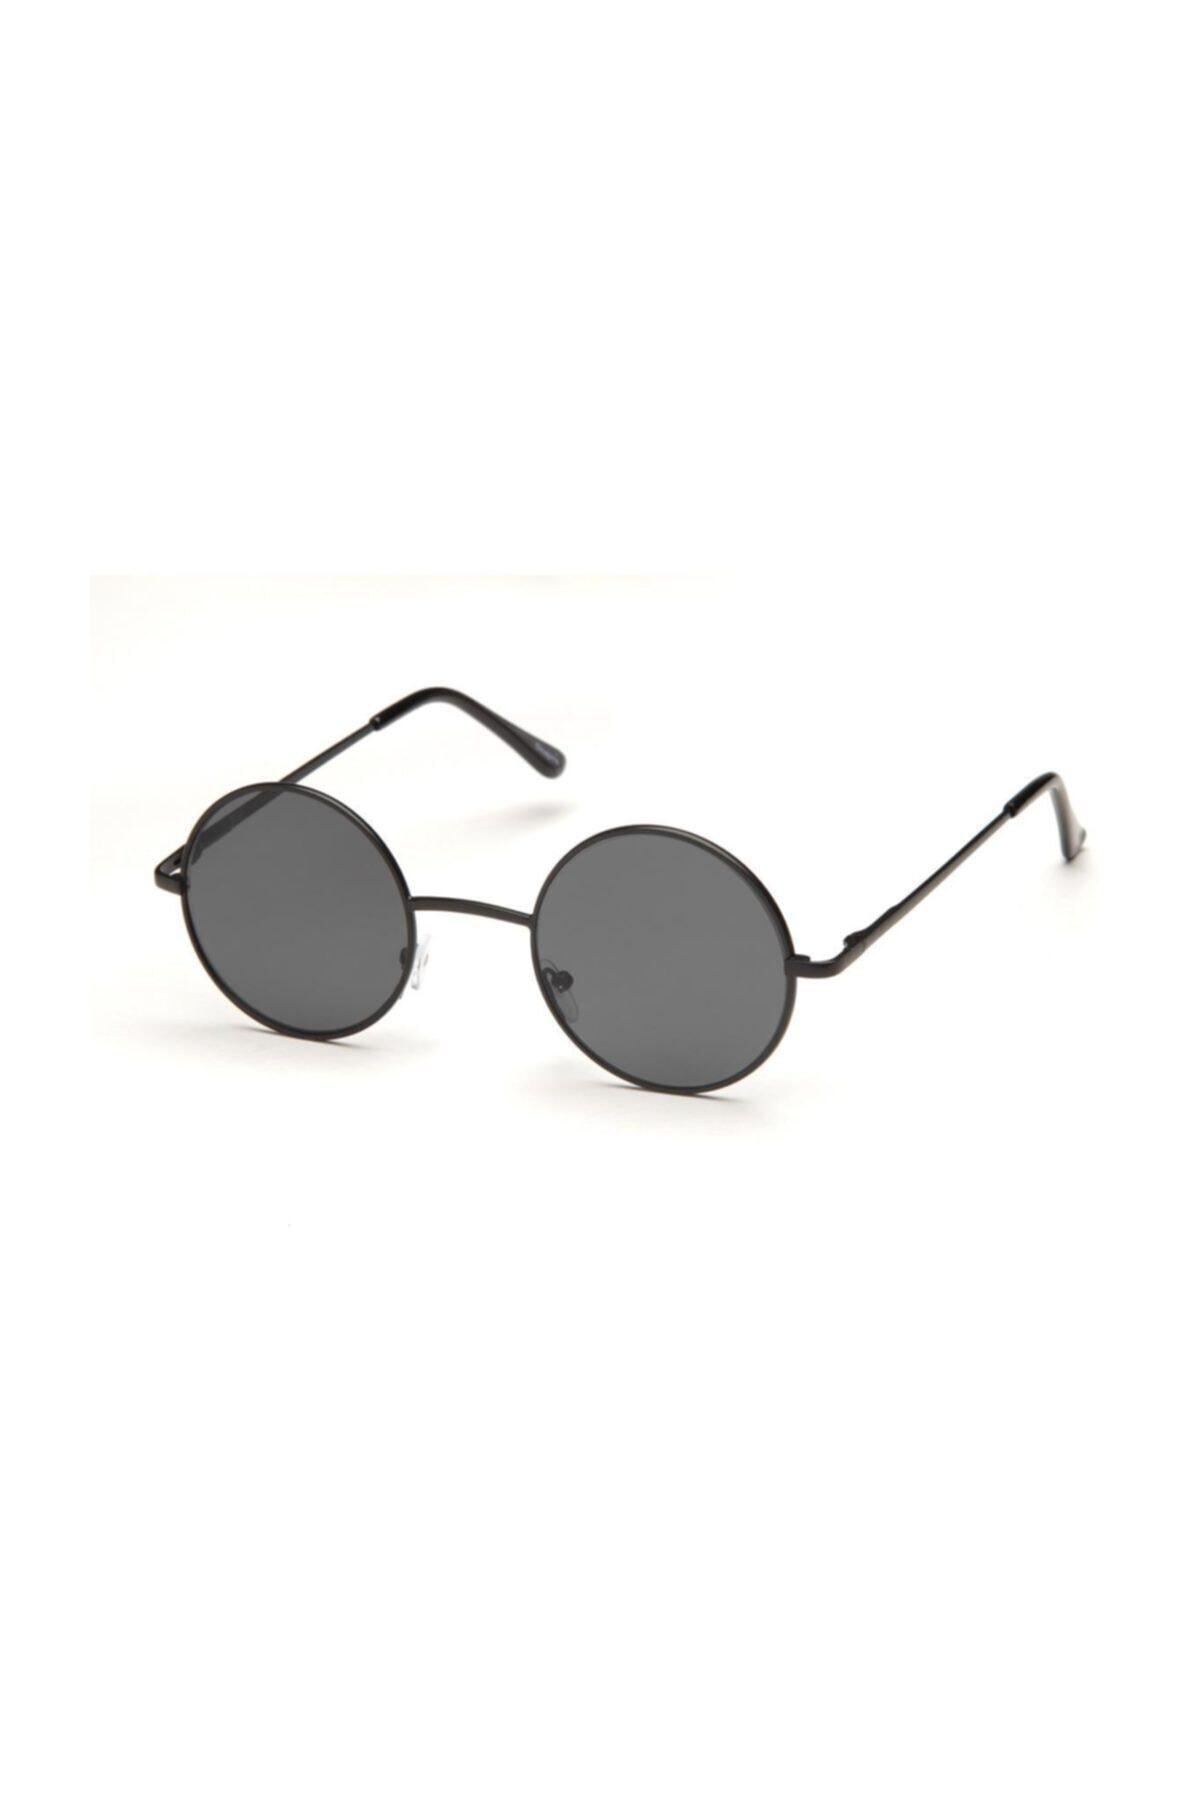 Di Caprio Unisex Yuvarlark Güneş Gözlüğü DH1569A 1